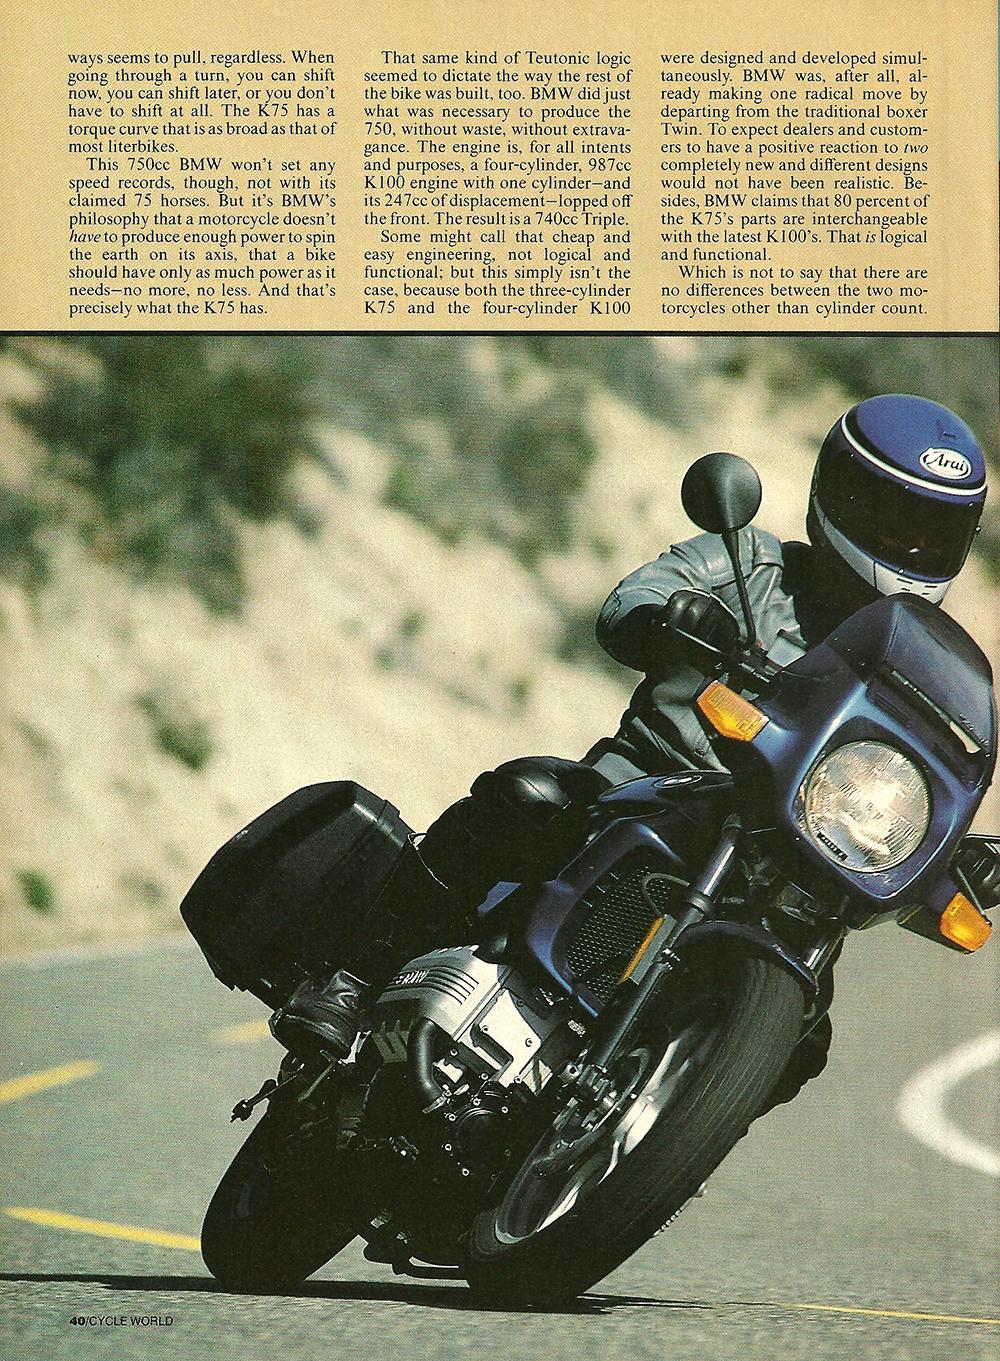 1986 BMW k75c road test 03.jpg